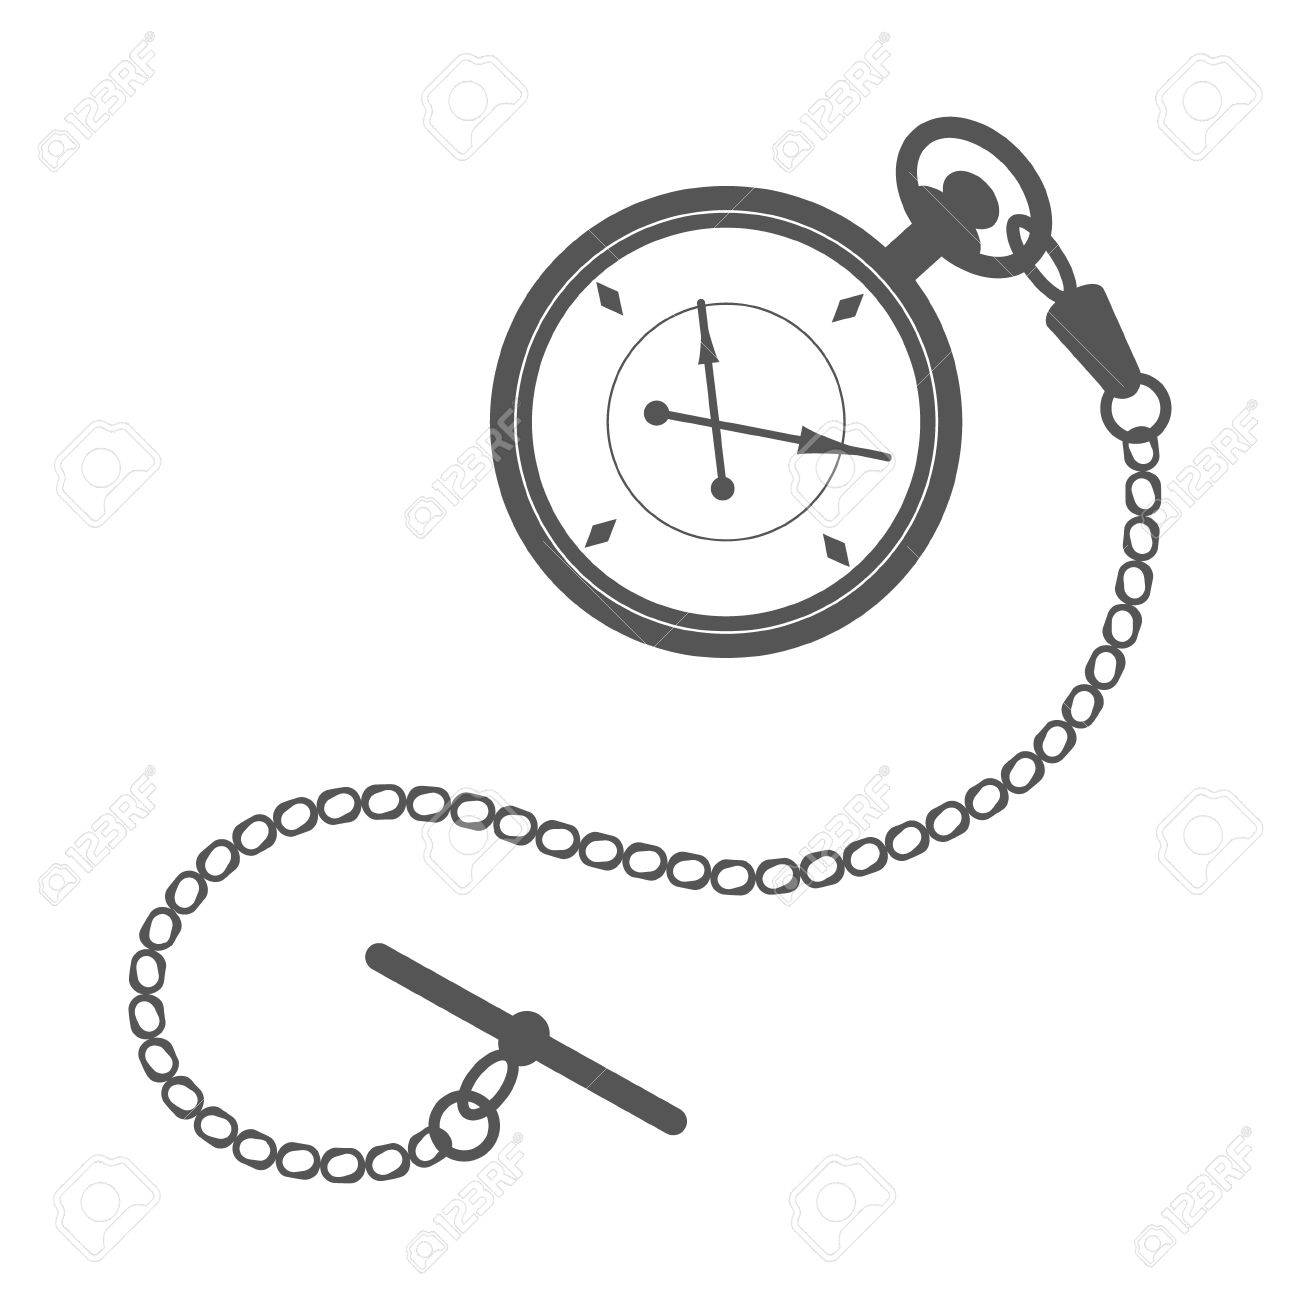 Reloj De Bolsillo Con Cadena. Plantilla De Diseño De La Etiqueta ...